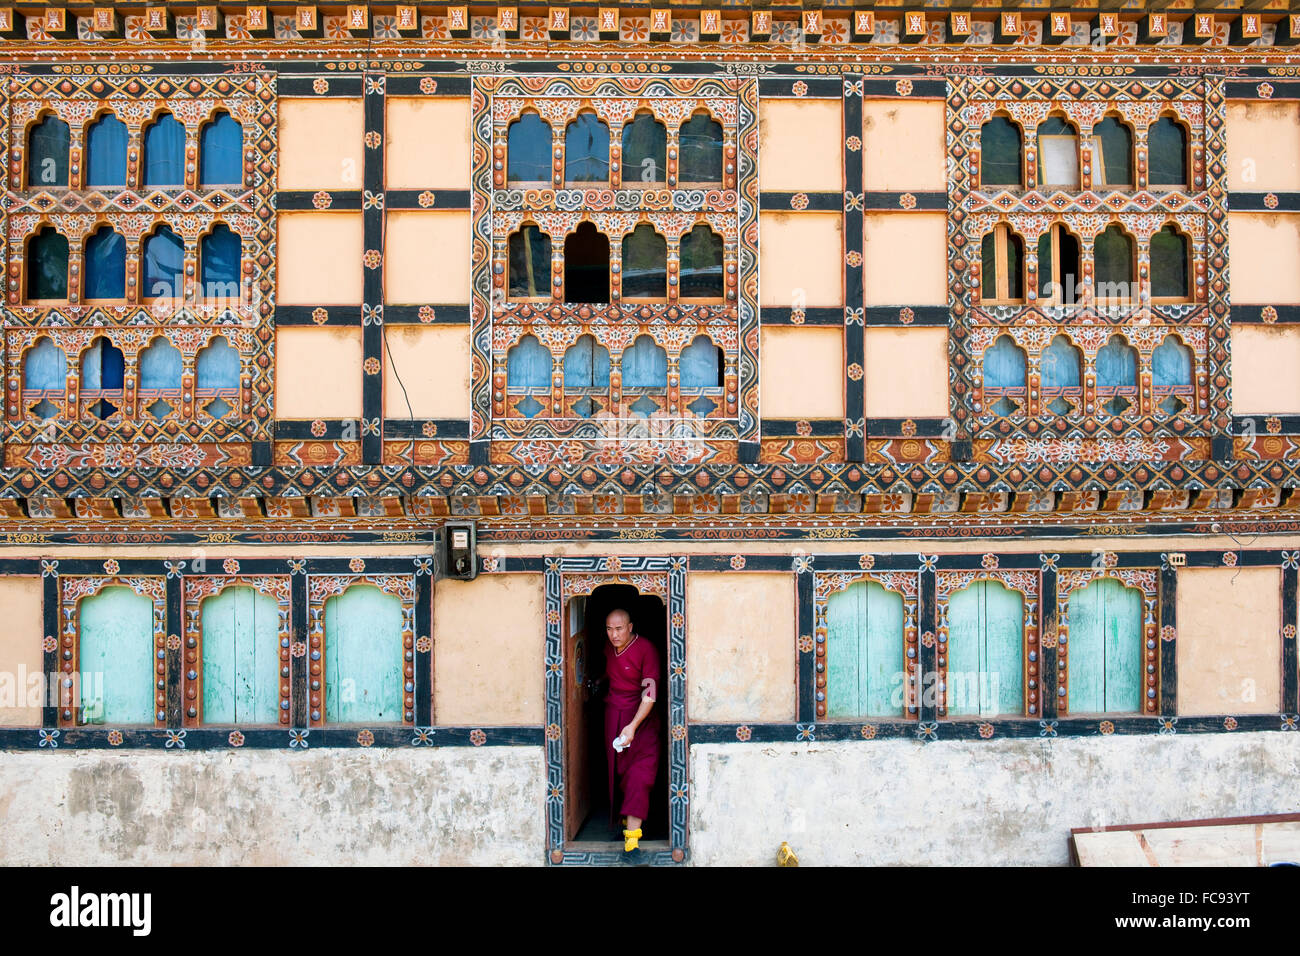 Monk leaving his house, Paro, Bhutan, Asia - Stock Image